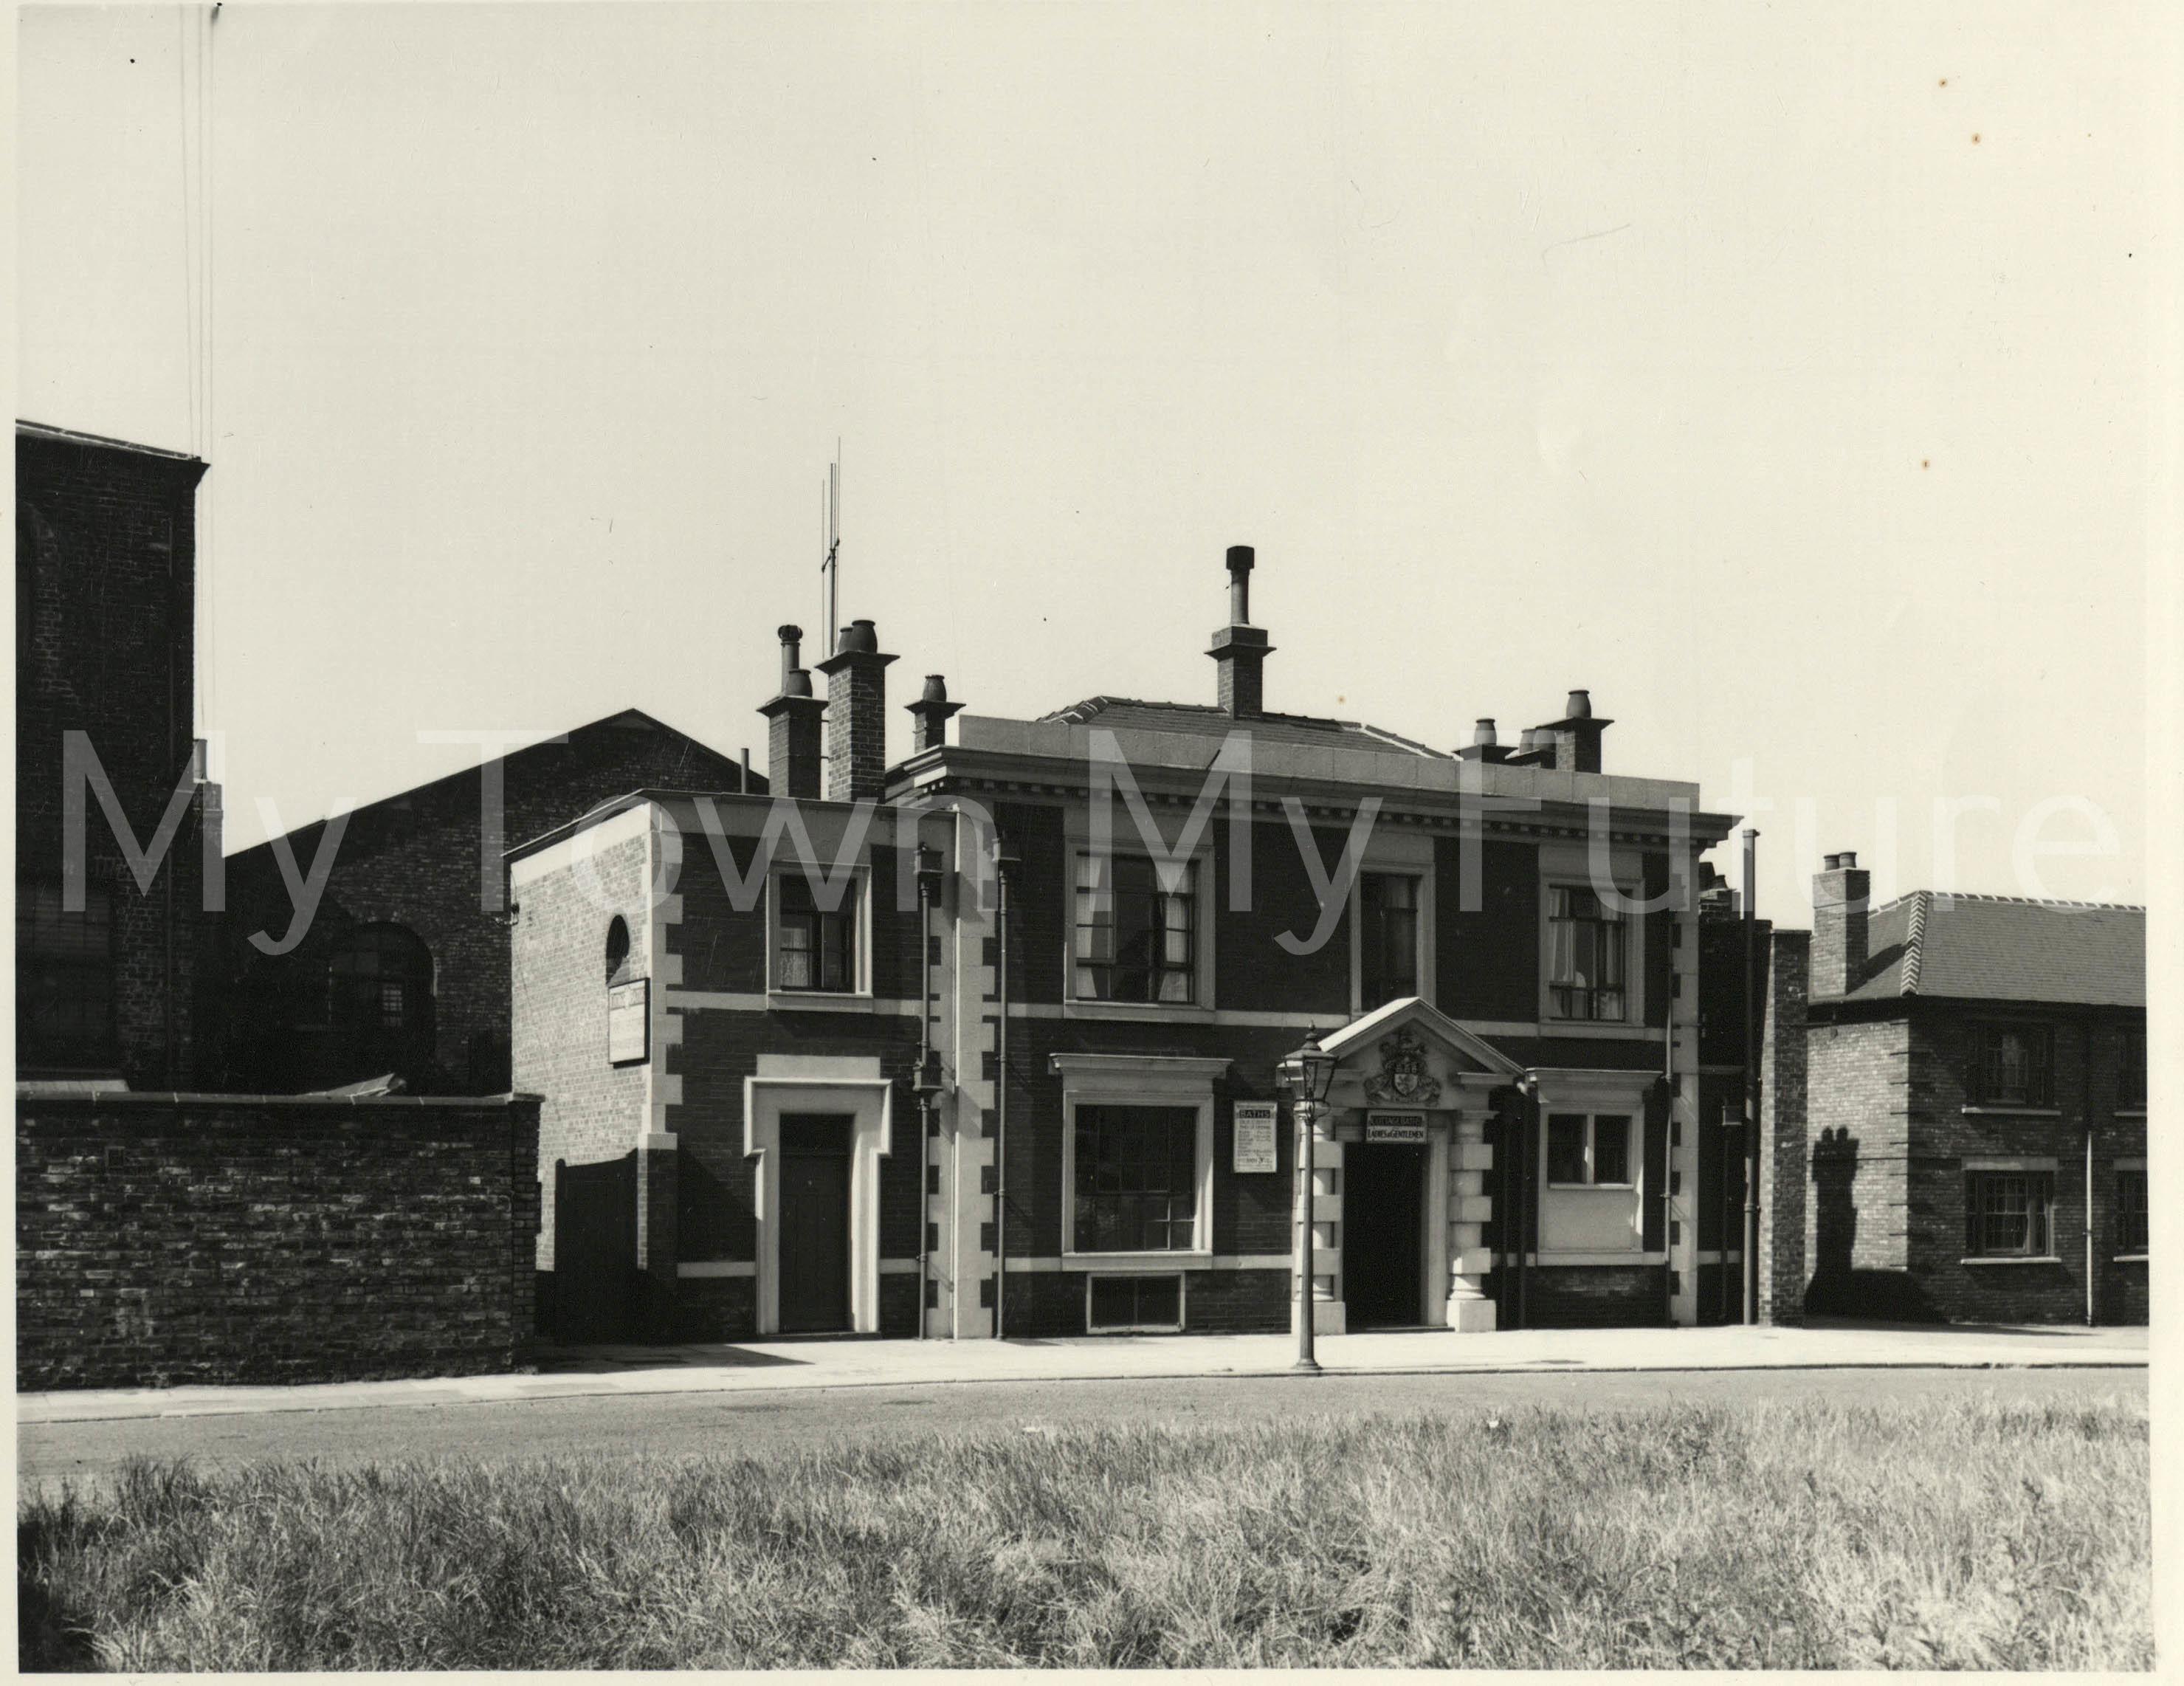 Dacre Street Baths, 1955 - Borough Engineers Department